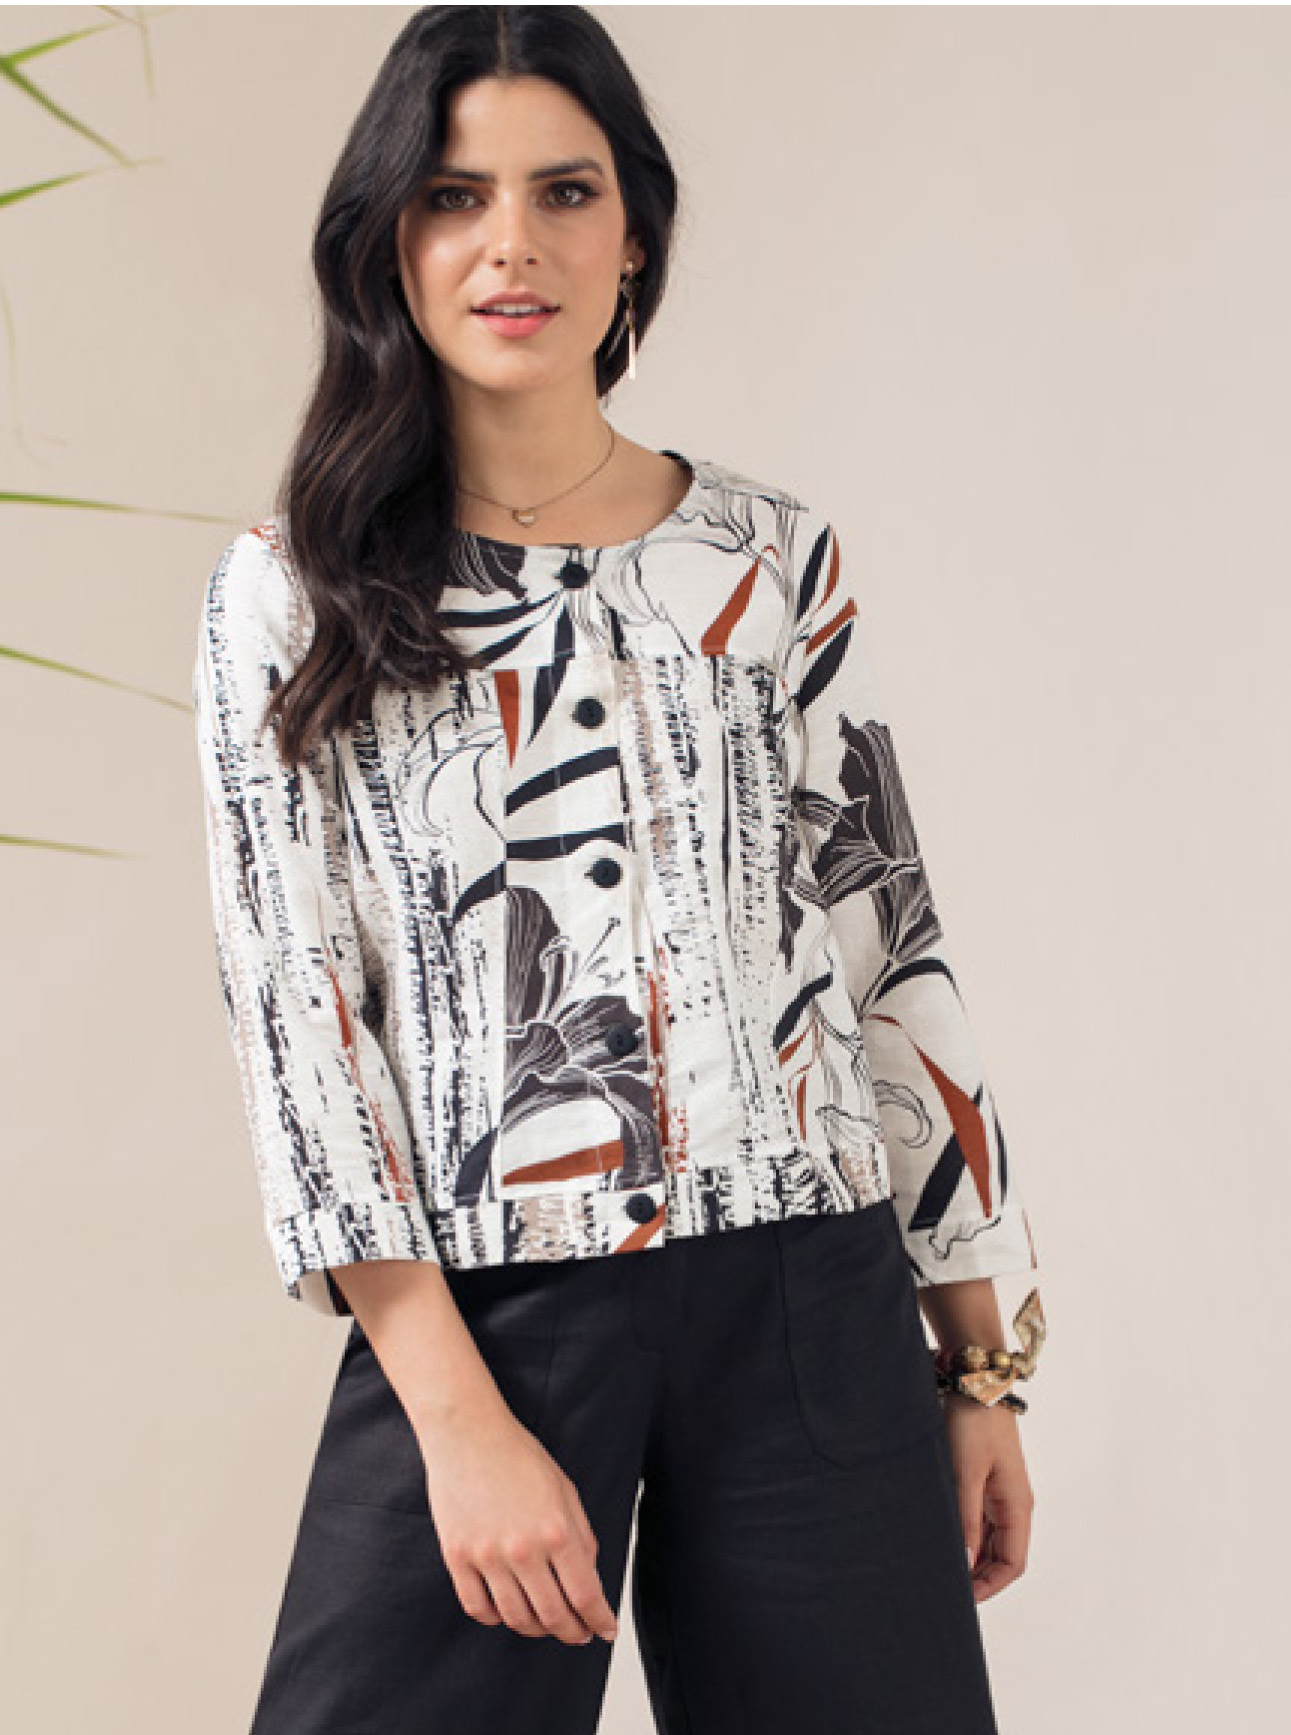 Maloka: Black Lily Sketch Art Soft Linen Jacket SOLD OUT MK_YUNET